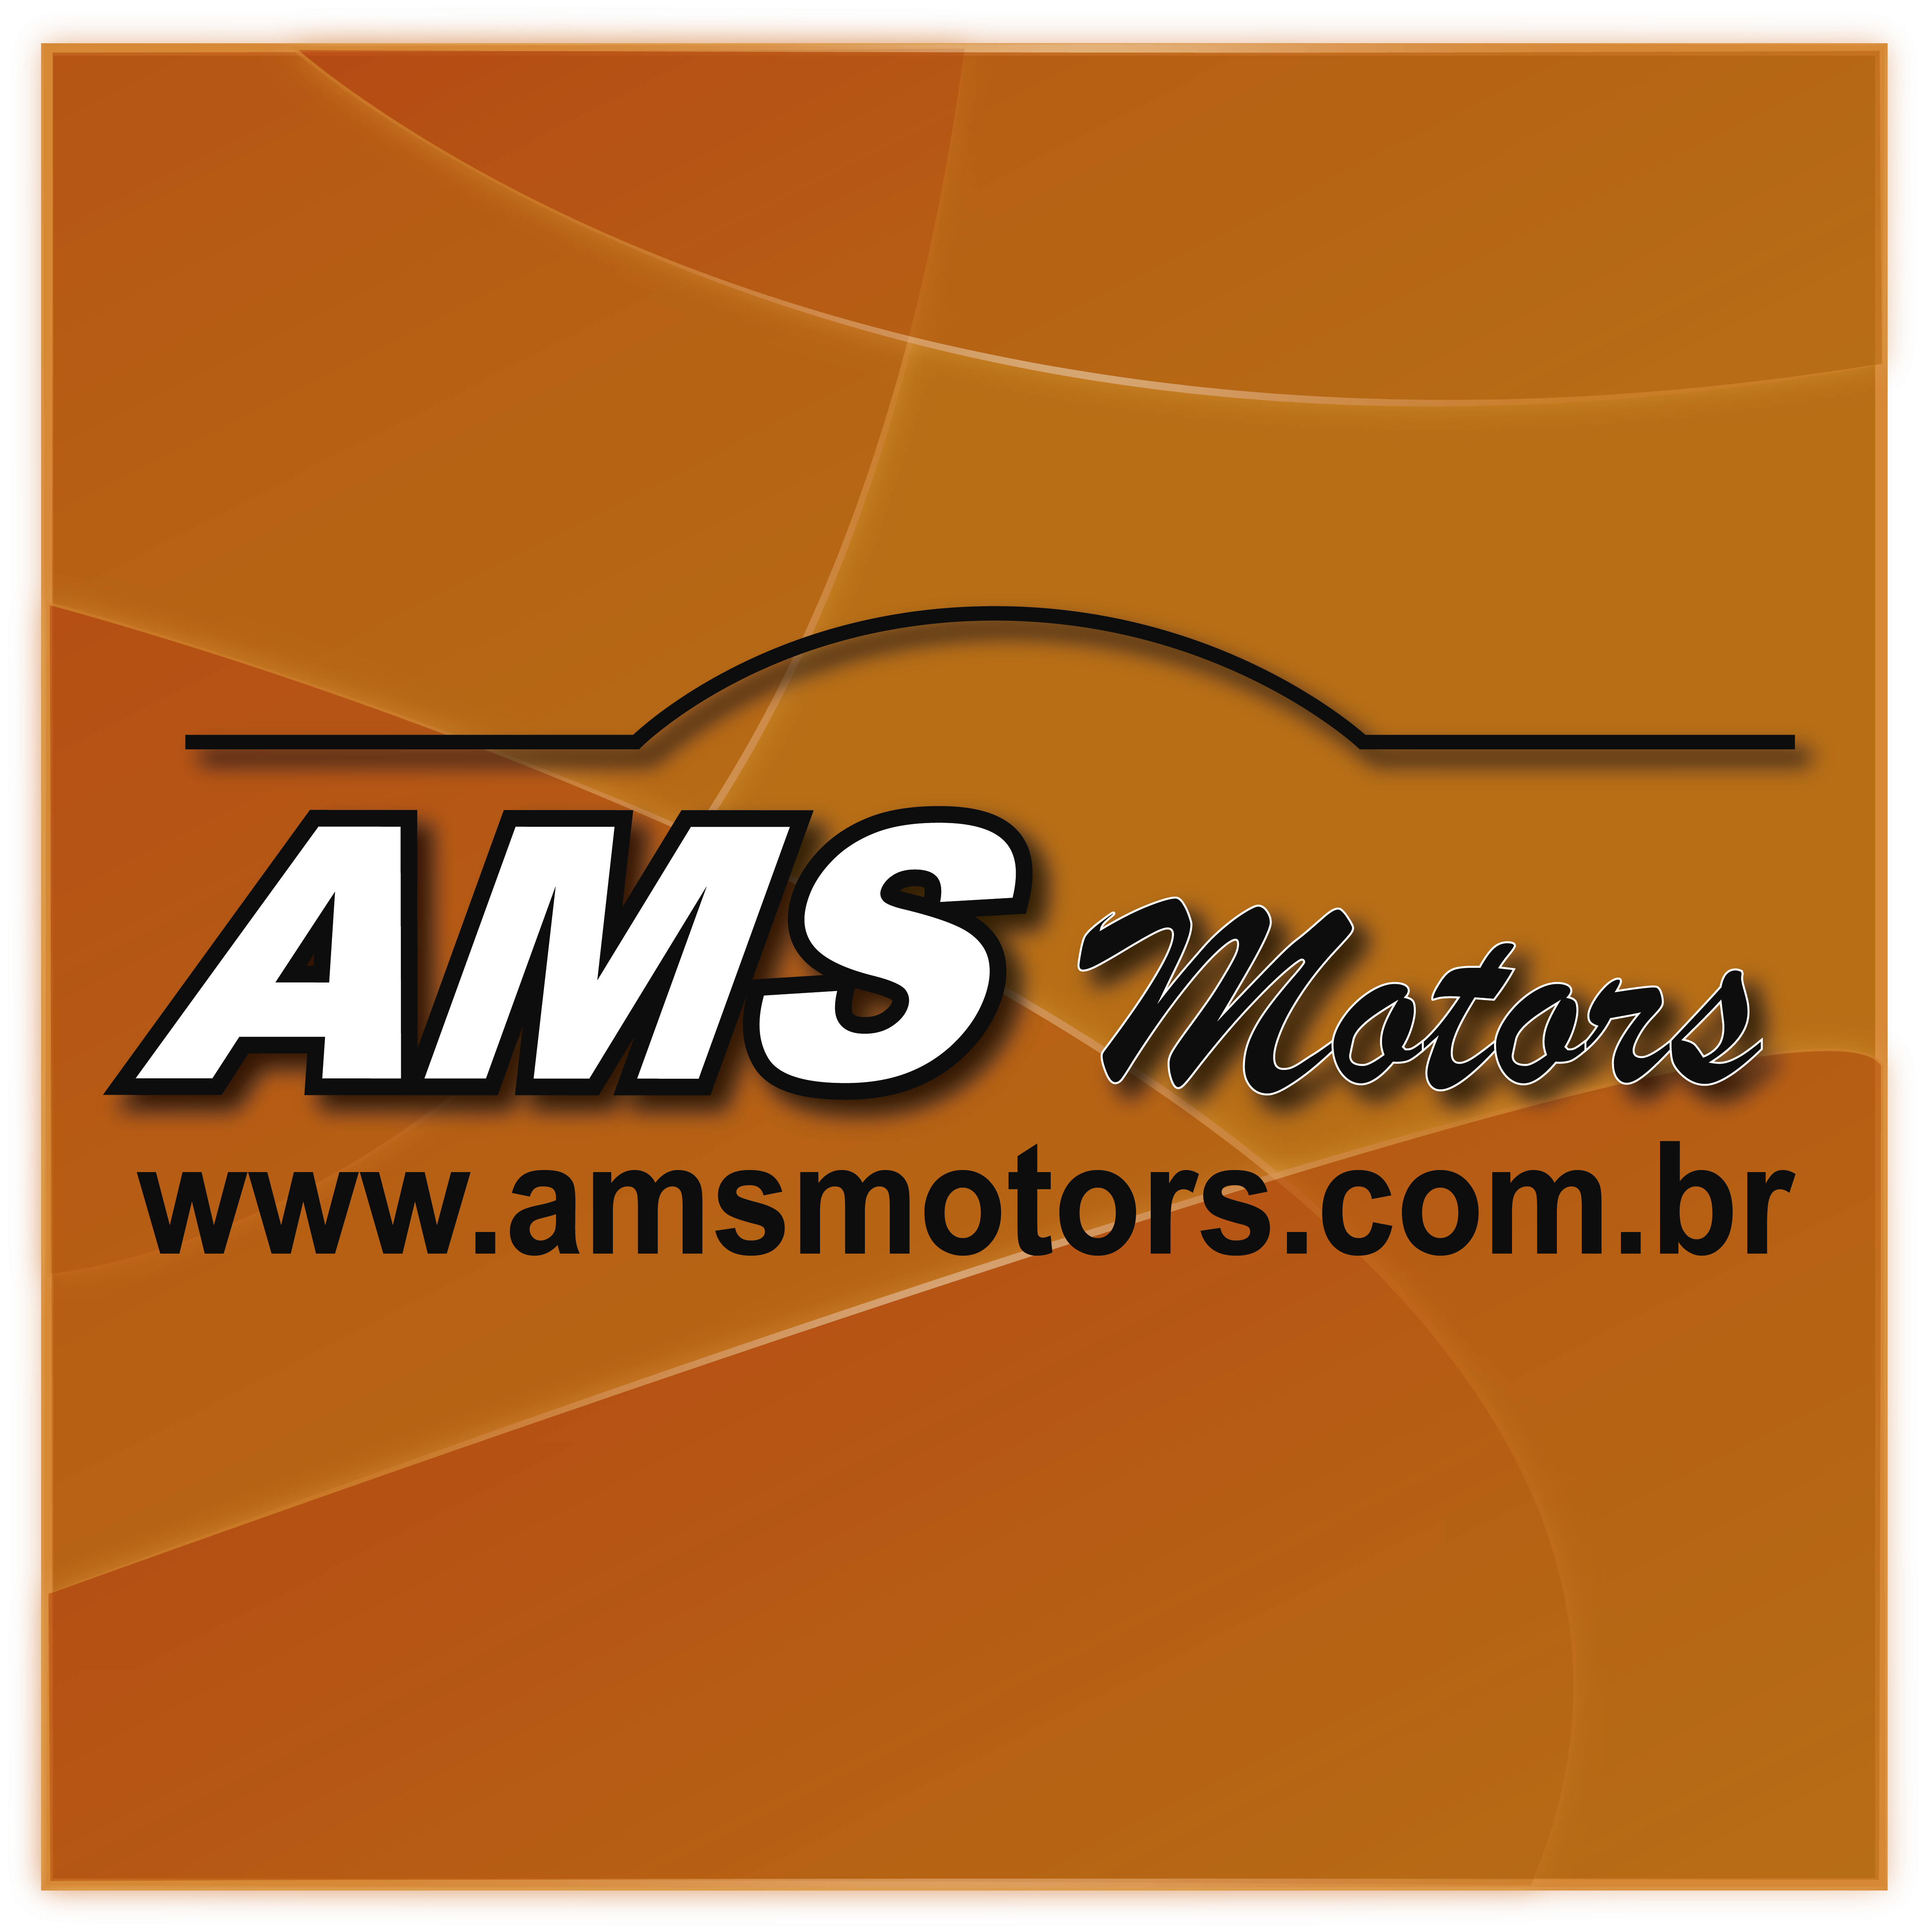 AMS MOTORS